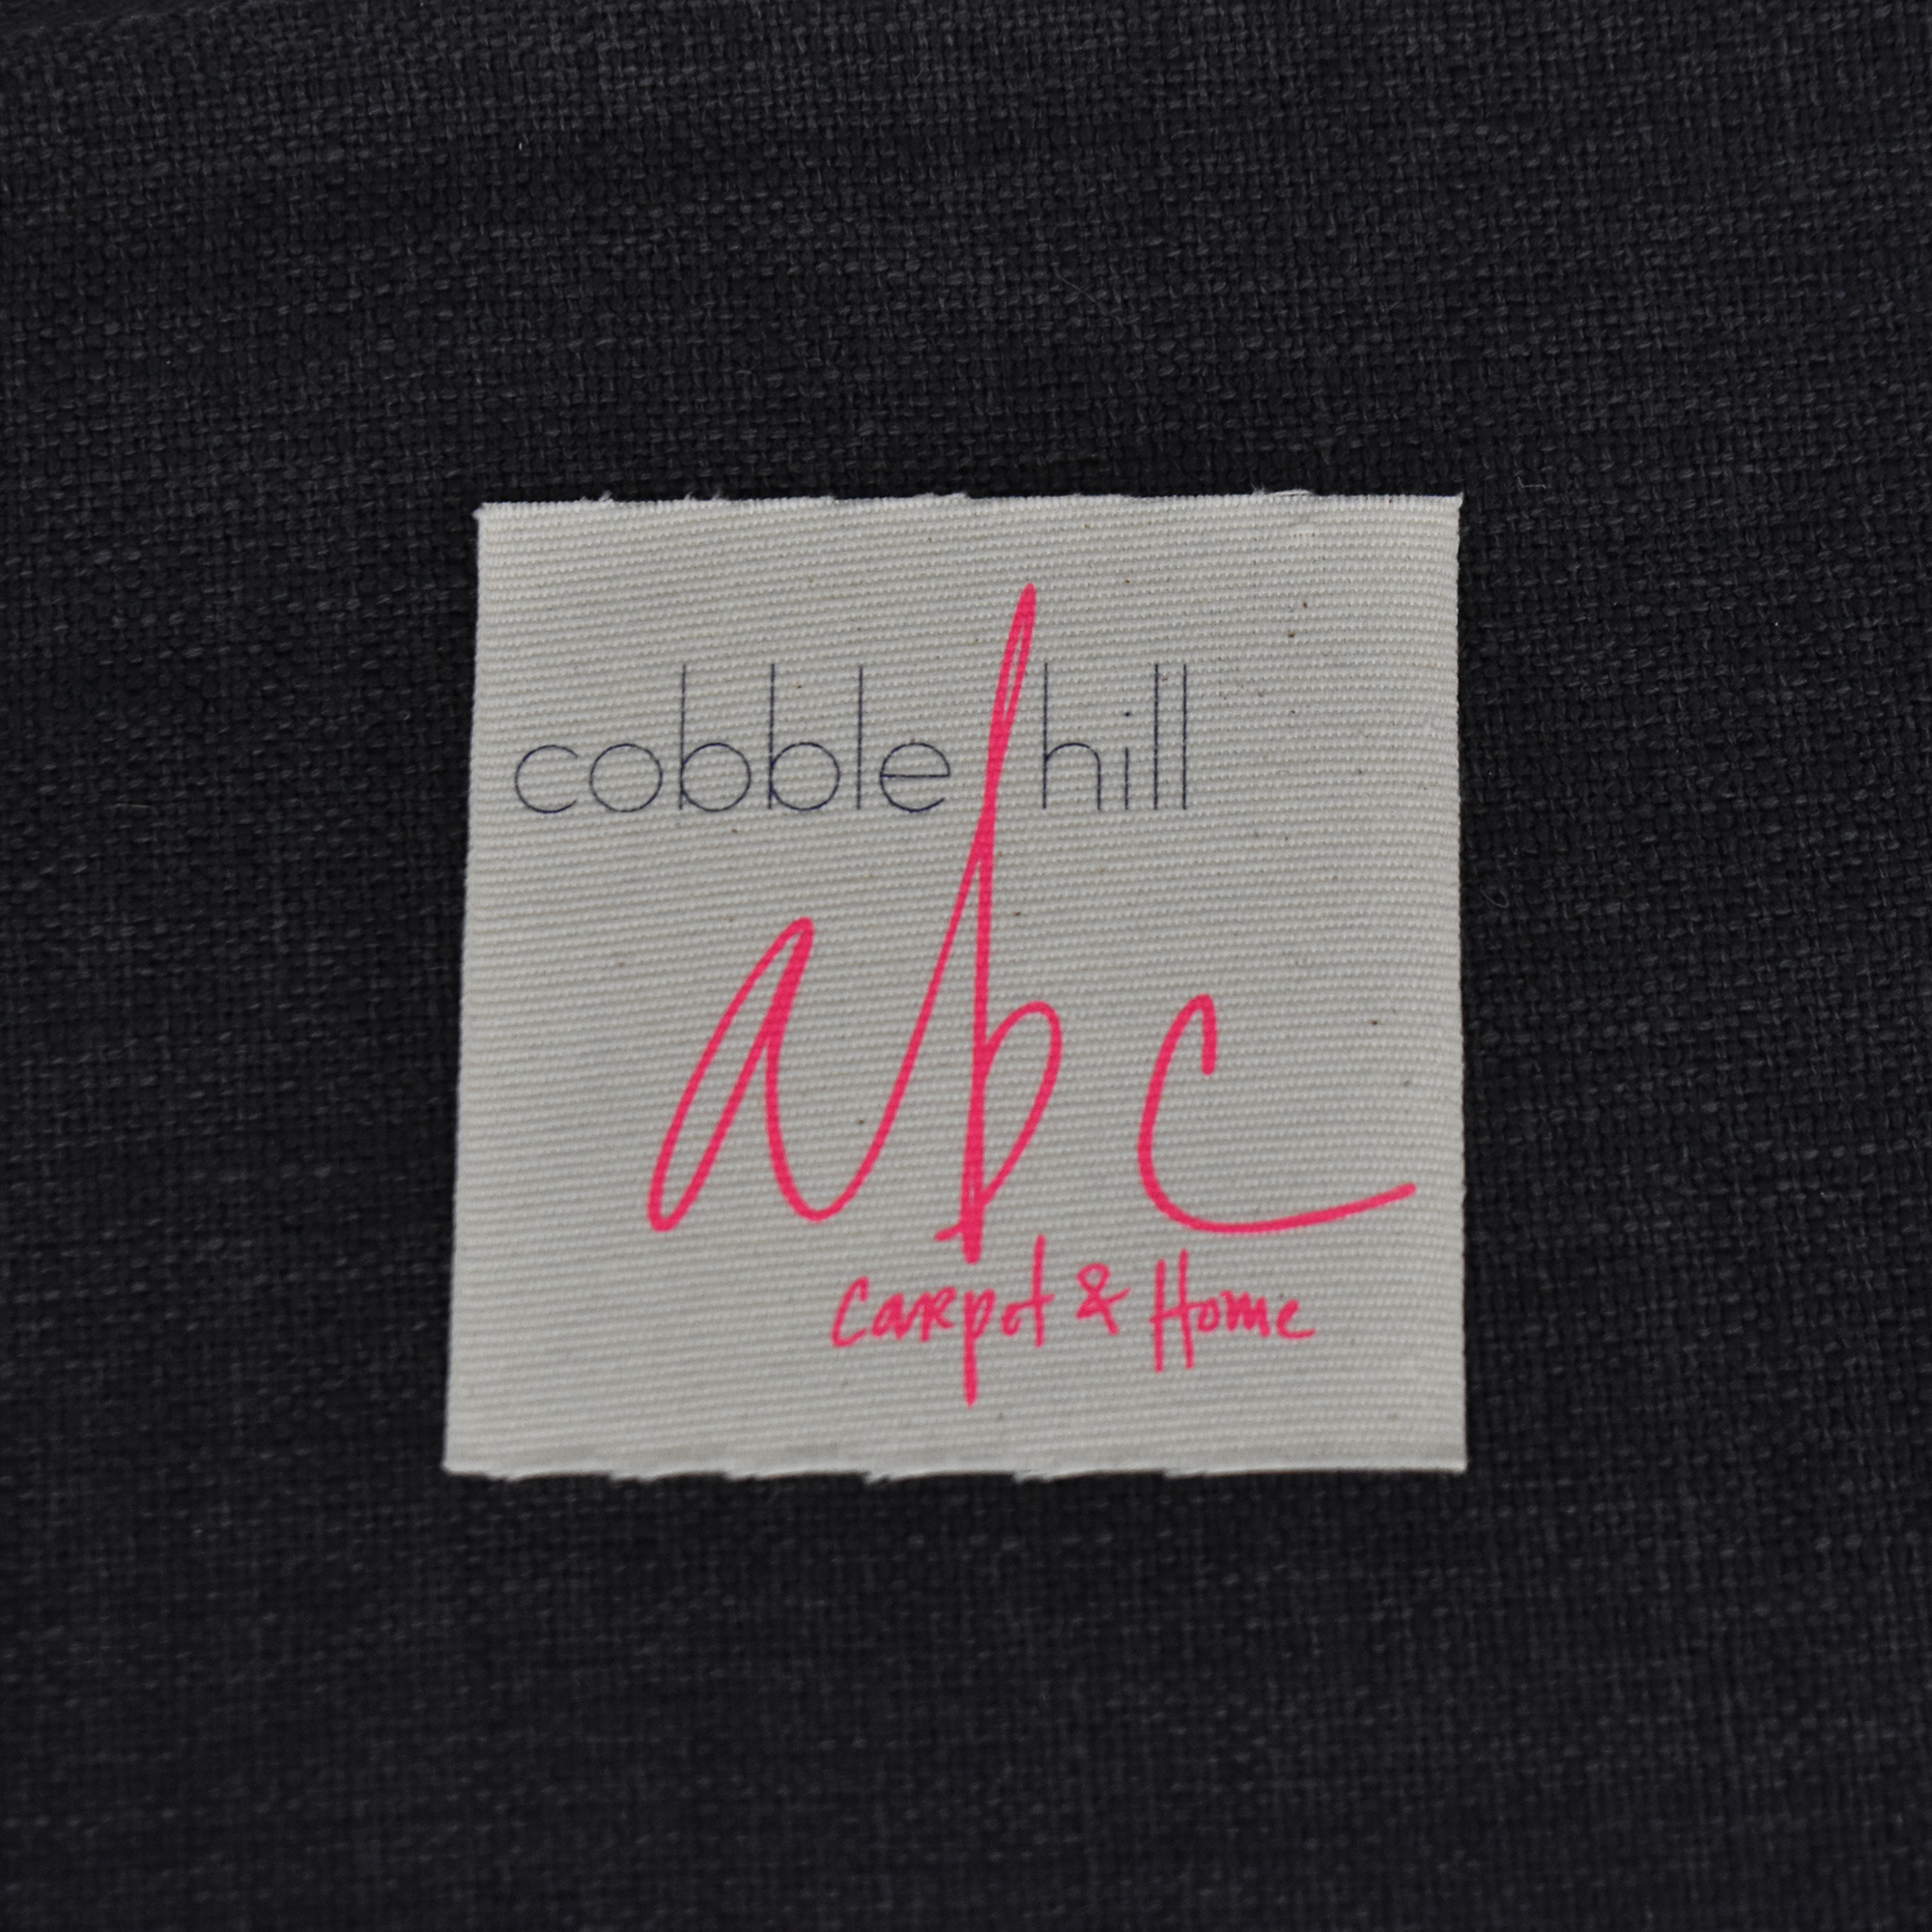 ABC Carpet & Home ABC Carpet & Home Cobble Hill Sleeper Sofa coupon